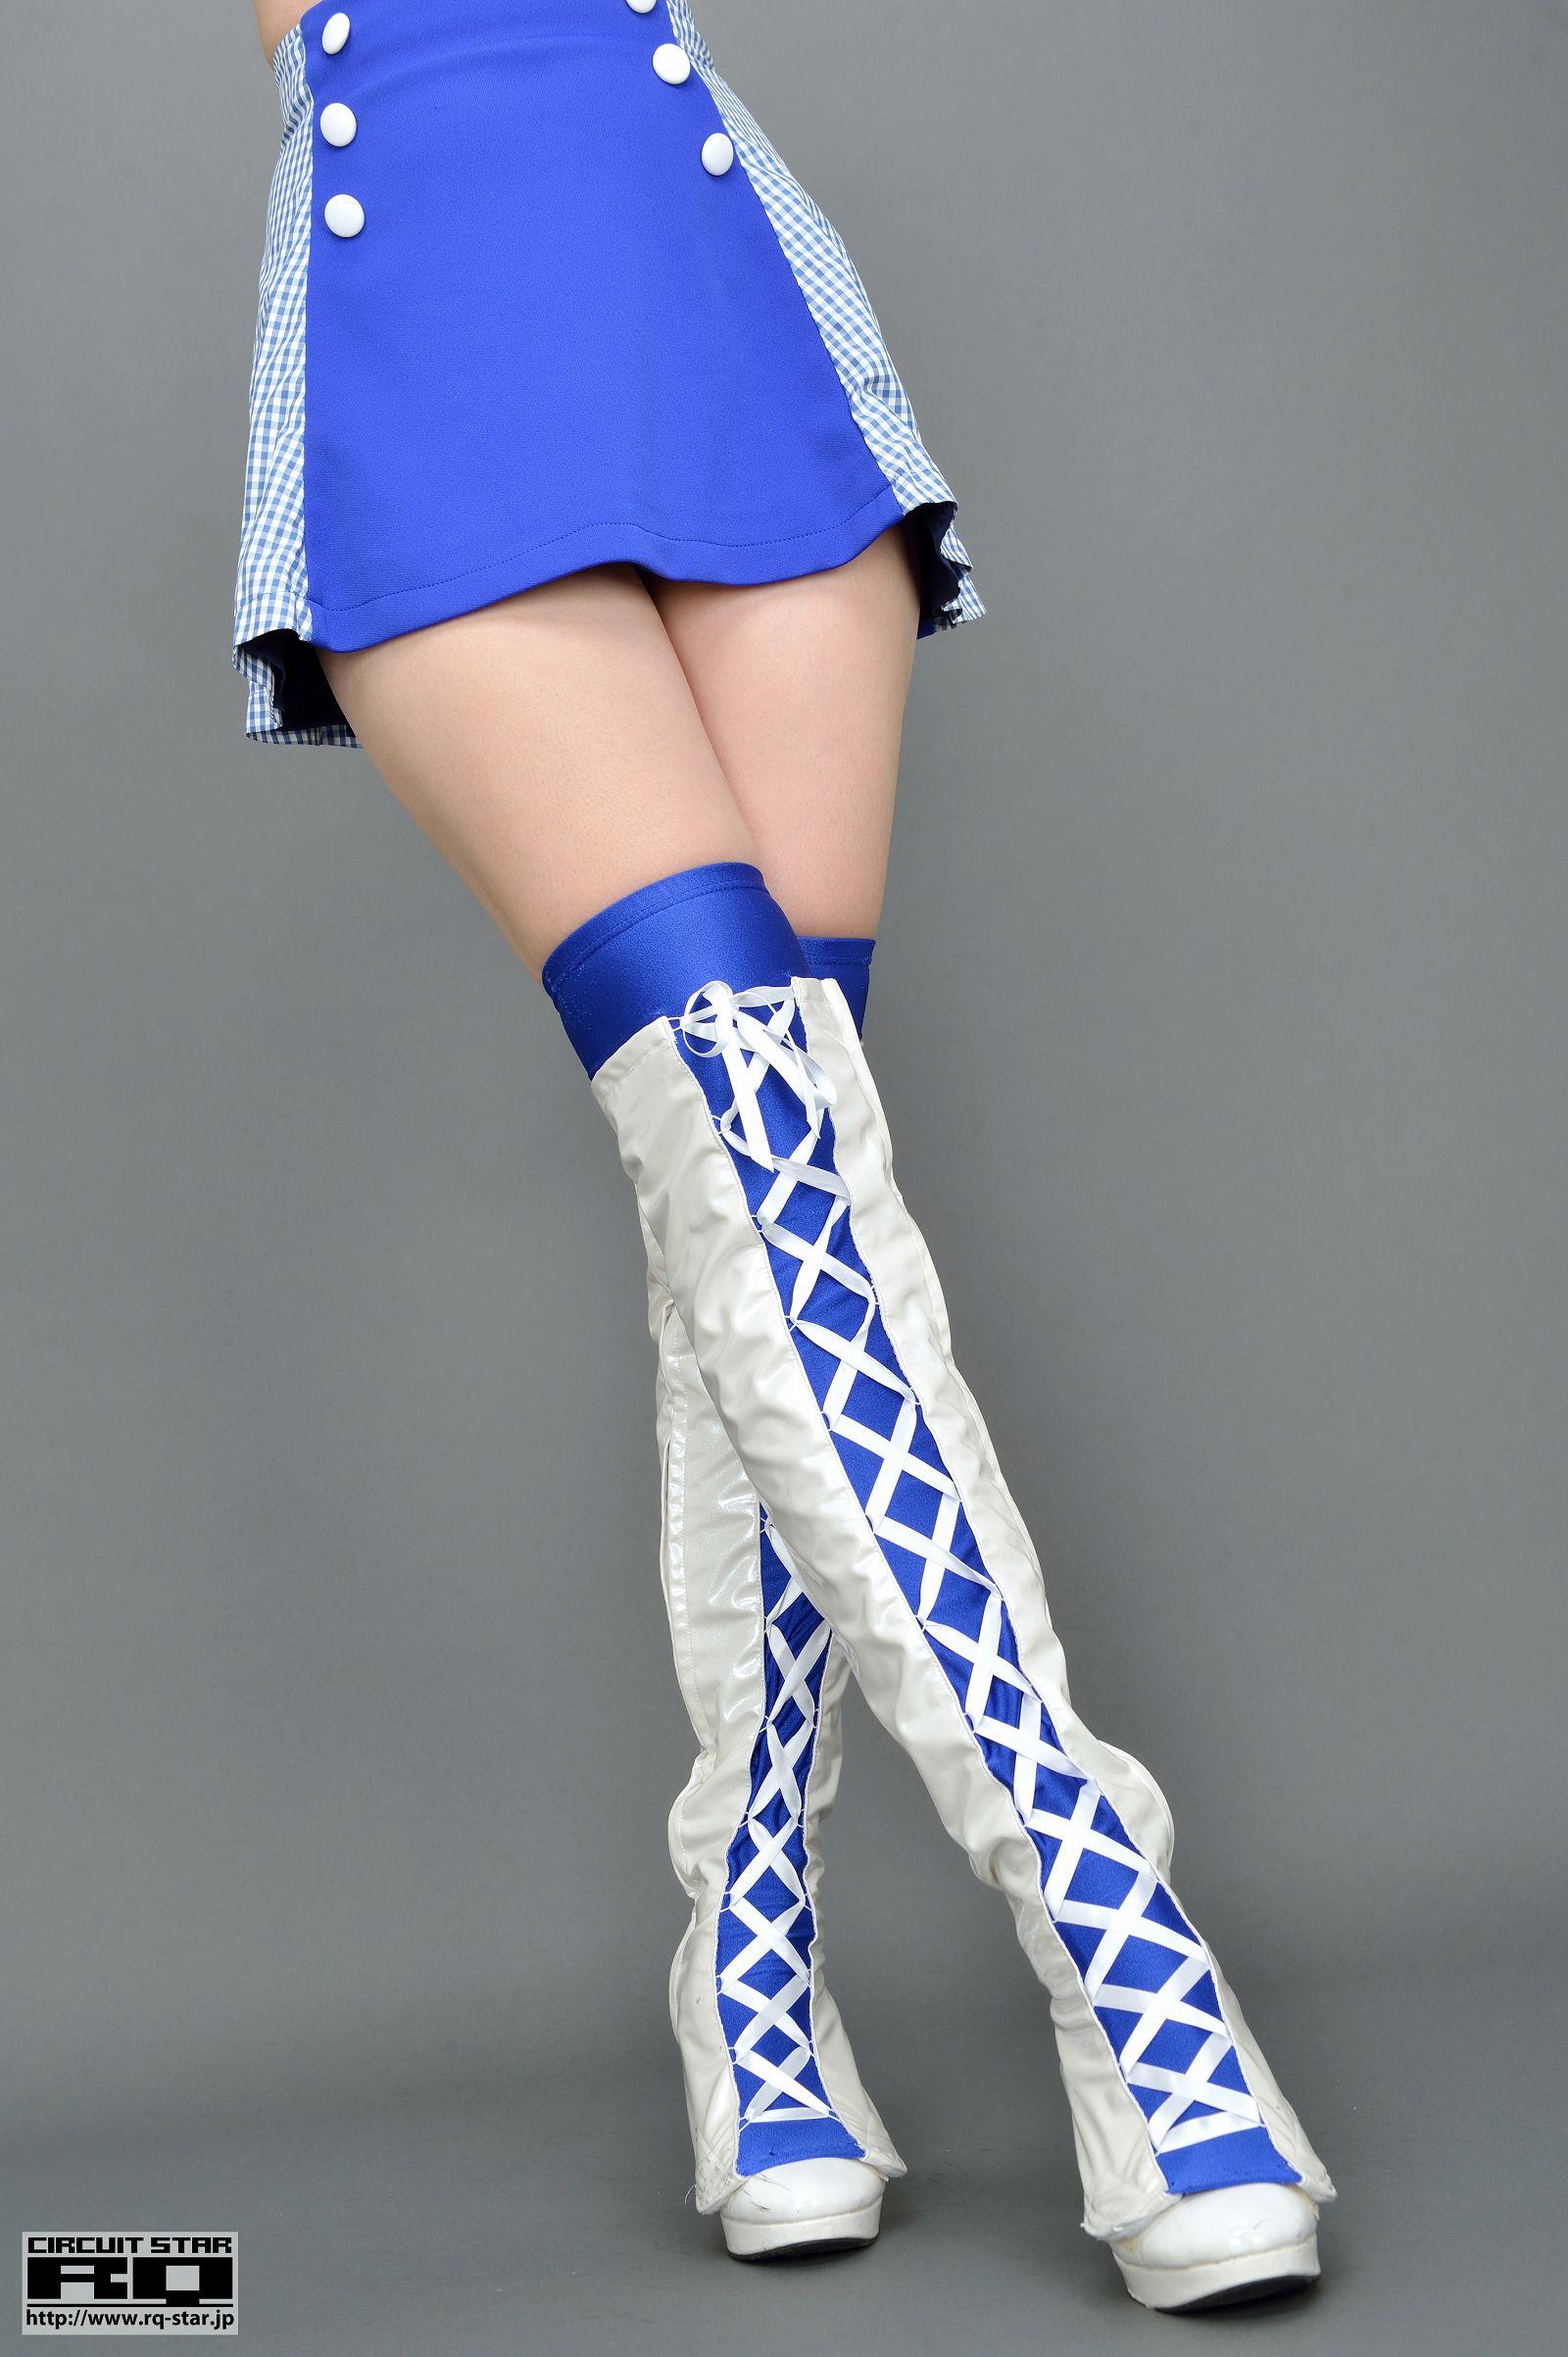 [RQ STAR美女] NO.00897 Ikumi Aihara 相原育美 Race Queen[80P] RQ STAR 第4张